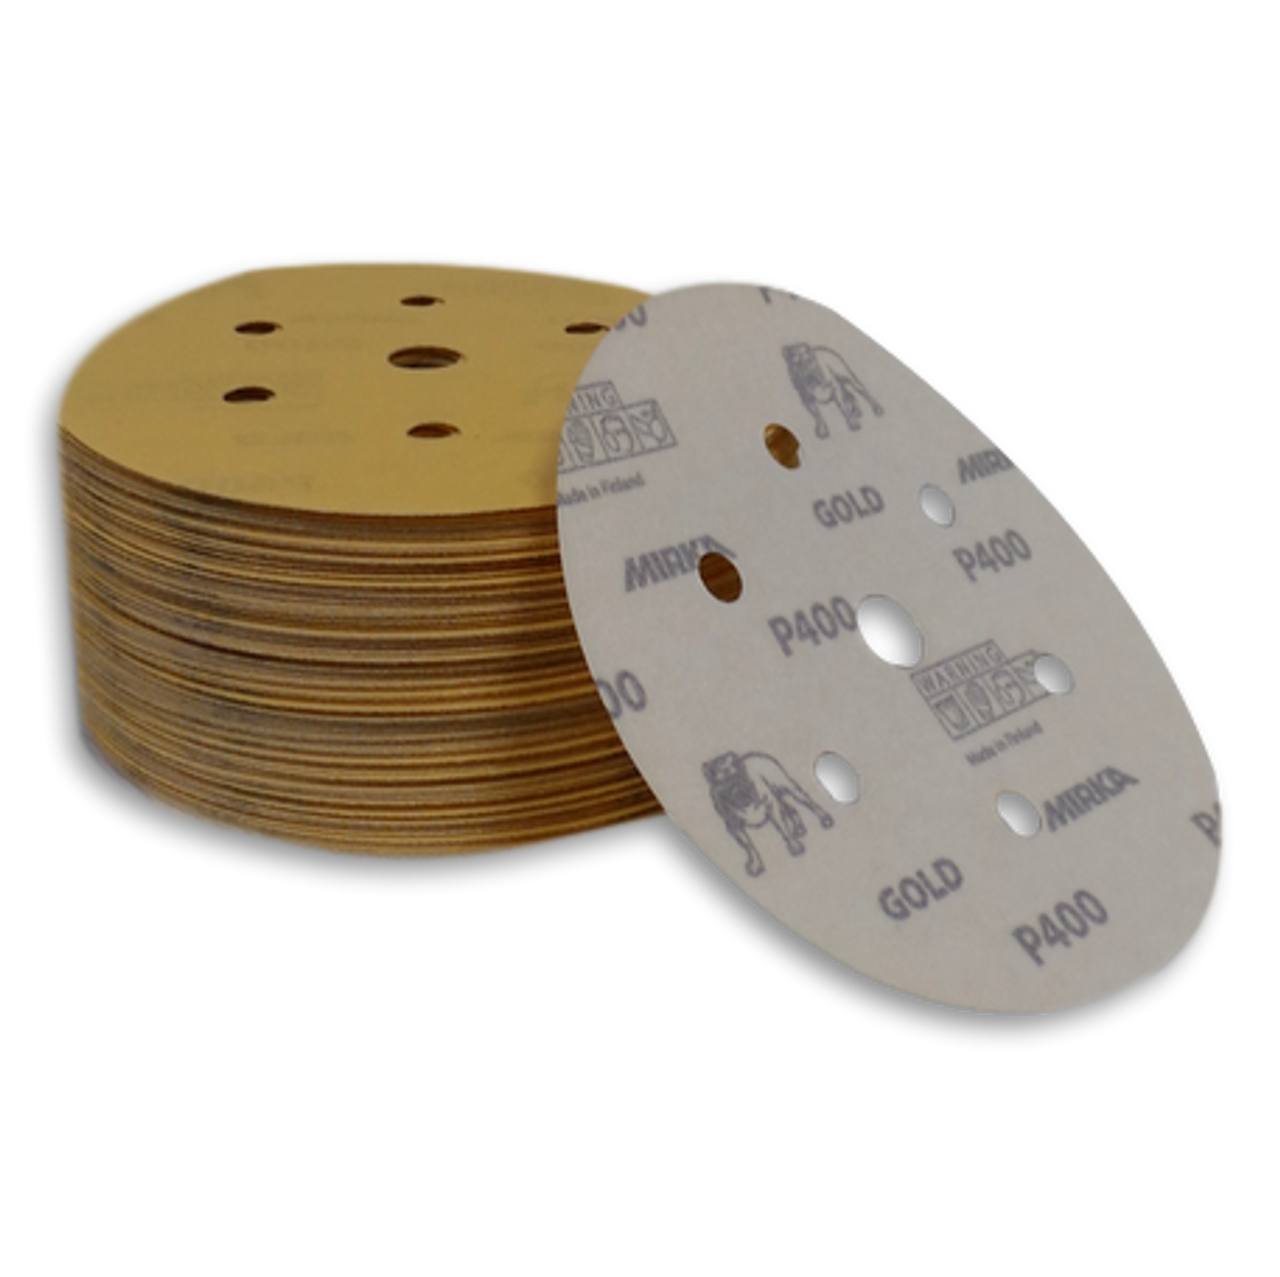 P400 Gold Velcro Sanding Discs 100 in a Box 150mm 7 Holes Mirka Sanding Discs